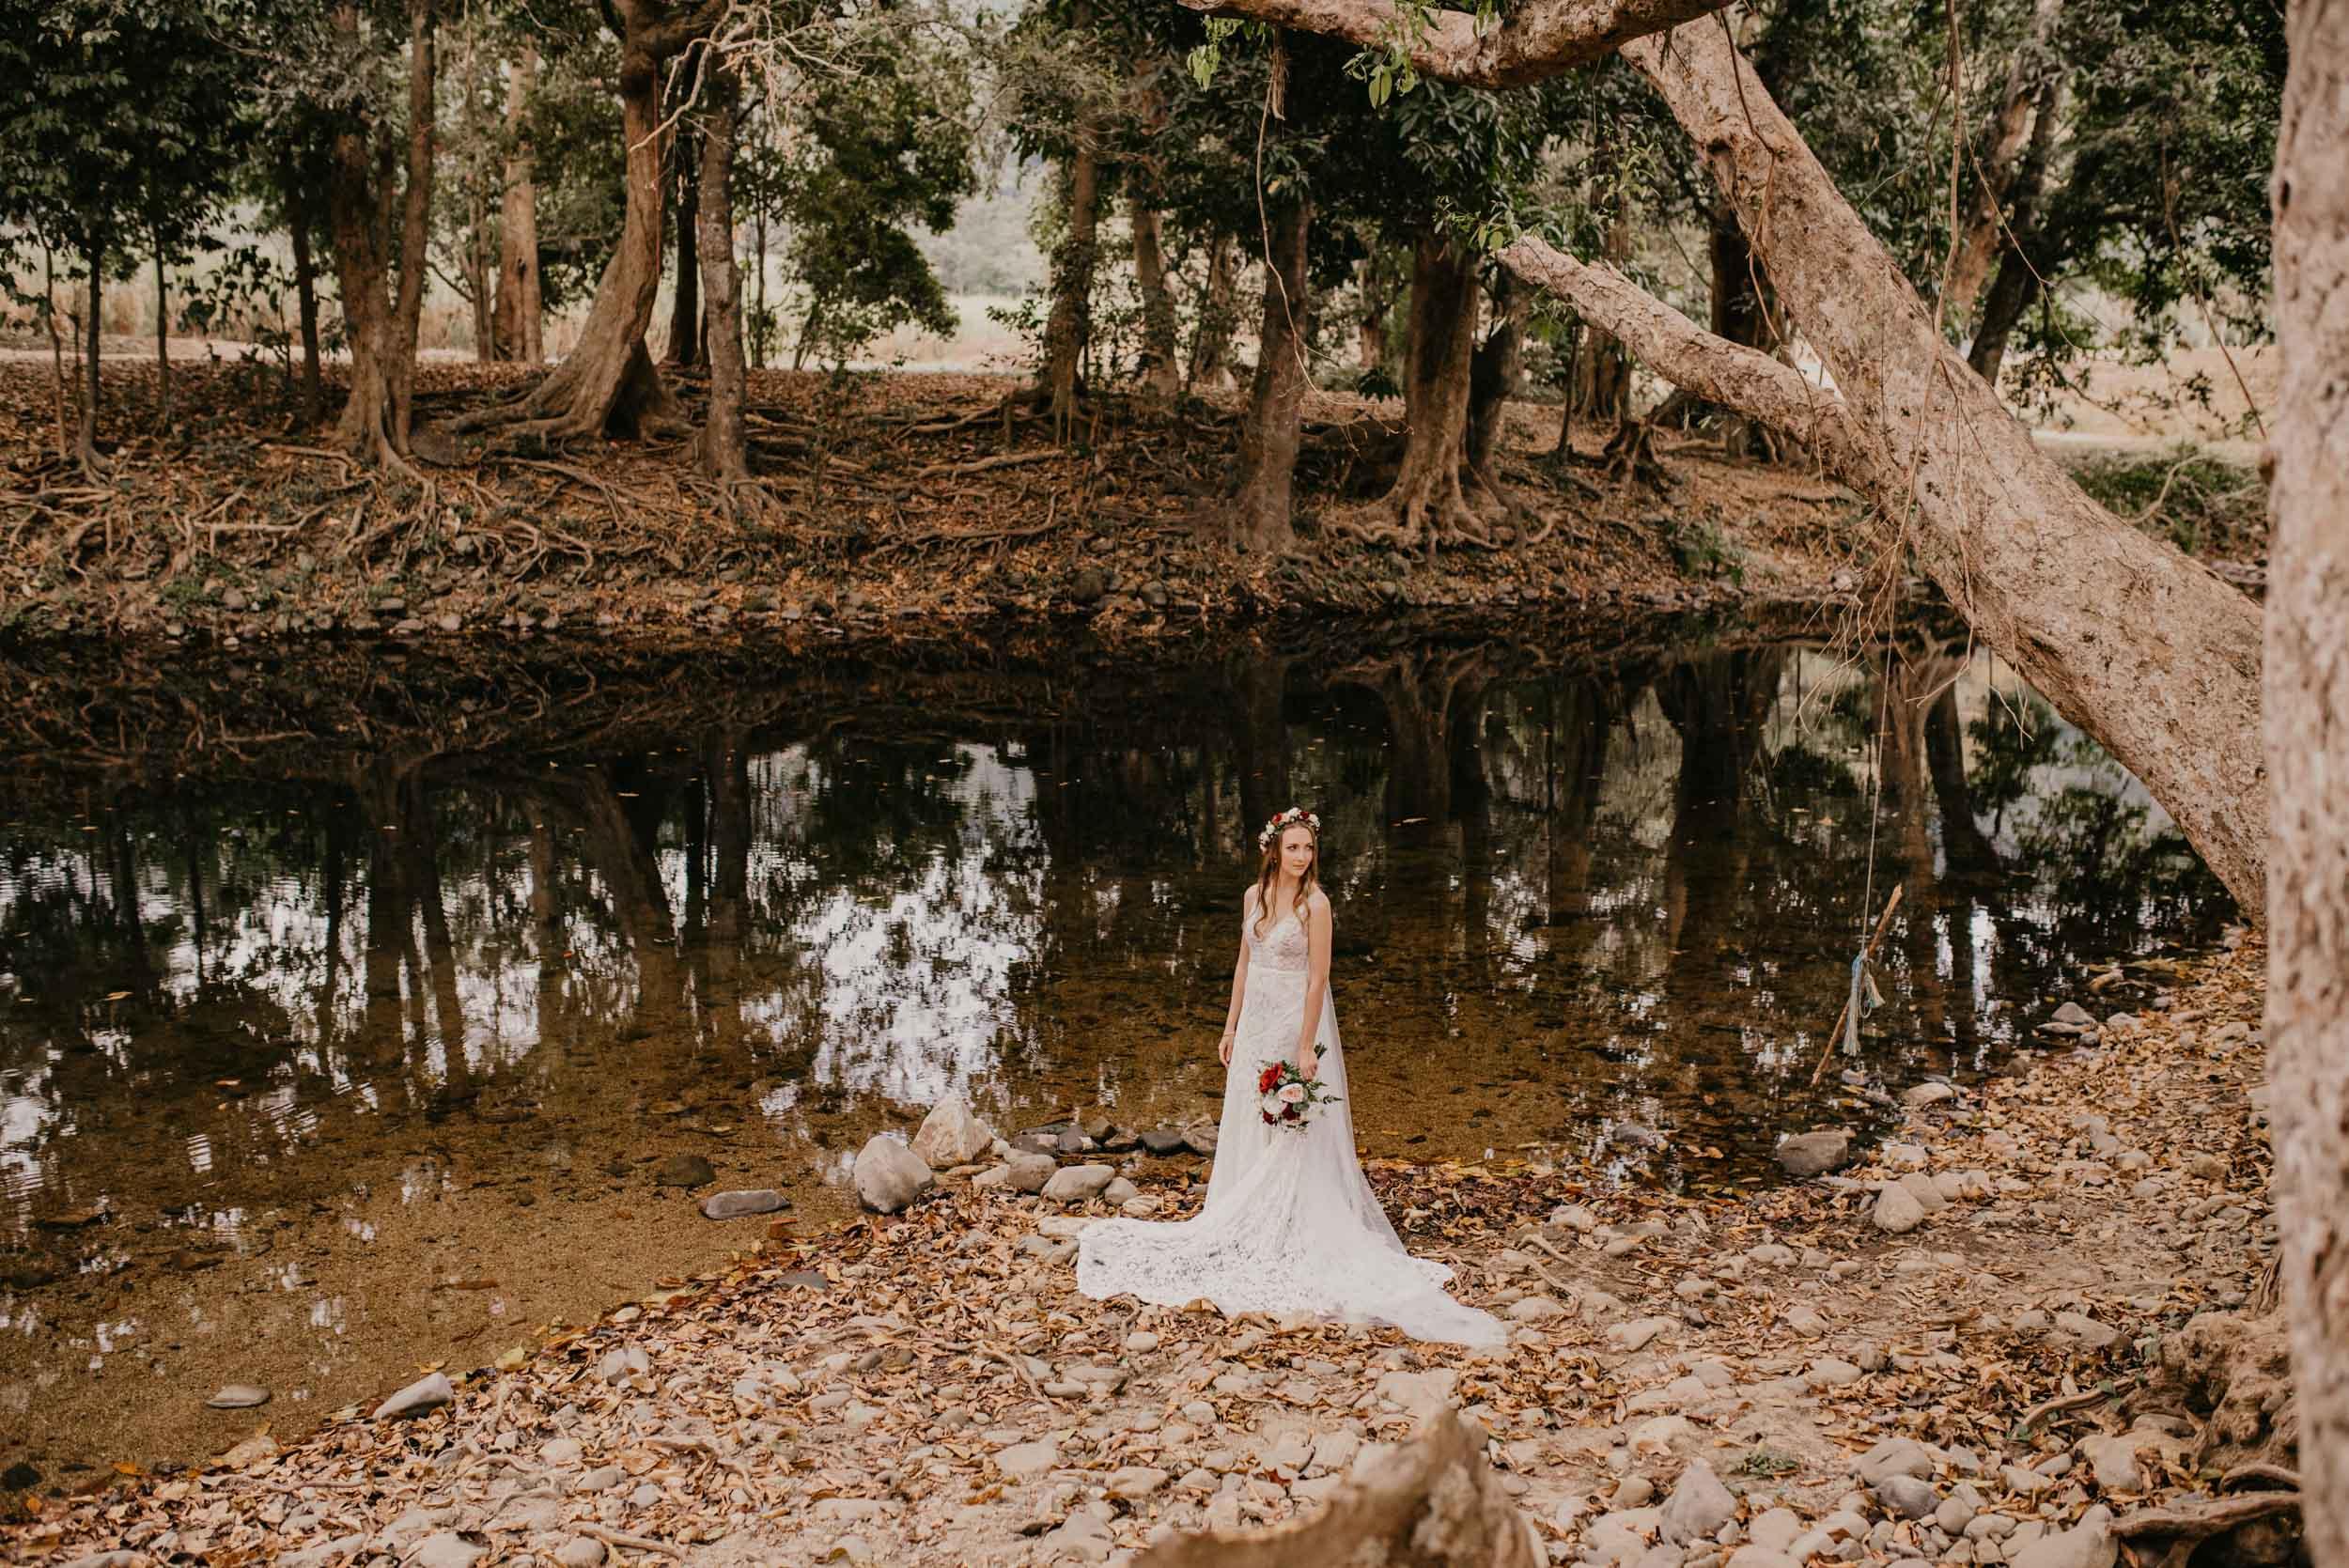 The Raw Photographer - Cairns Wedding Photographer - Laloli - Cairns Garden Ceremony - Cane Fields Photo Shoot-52.jpg